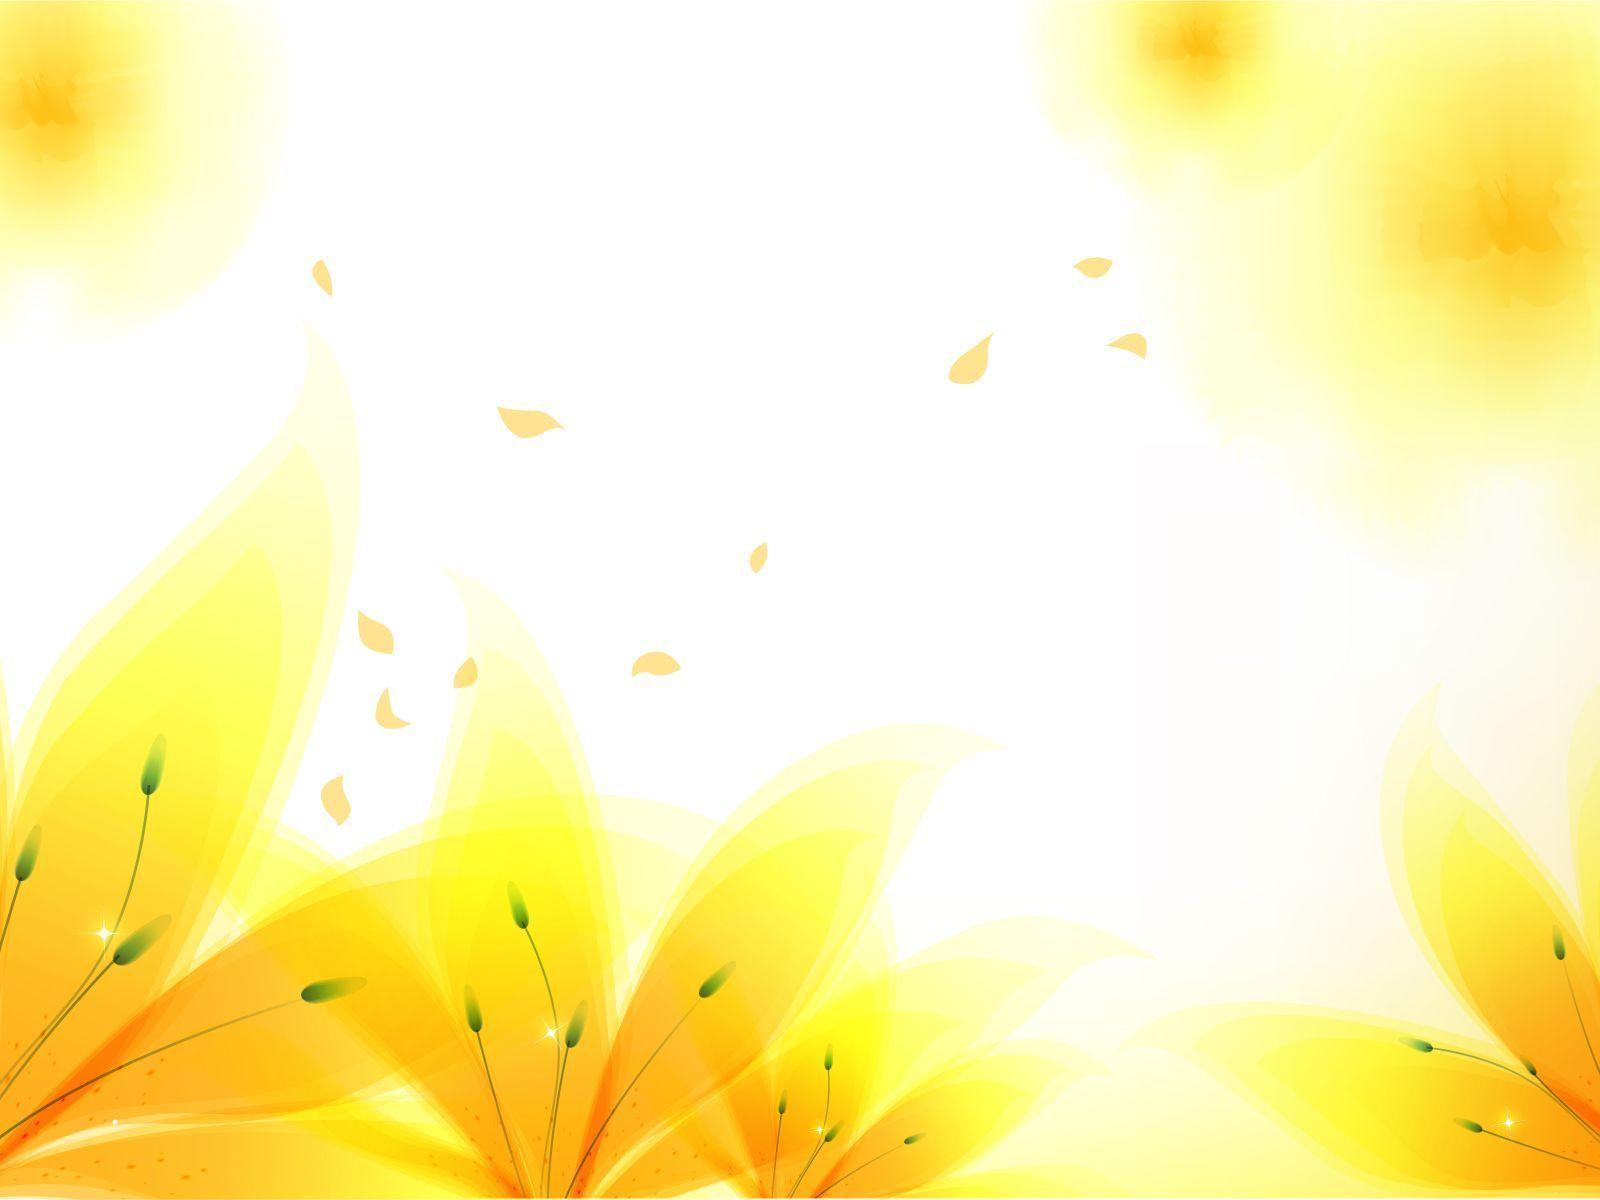 Fresh yellow flowers backgrounds flowers yellow ppt free fresh yellow flowers backgrounds for powerpoint templates toneelgroepblik Image collections